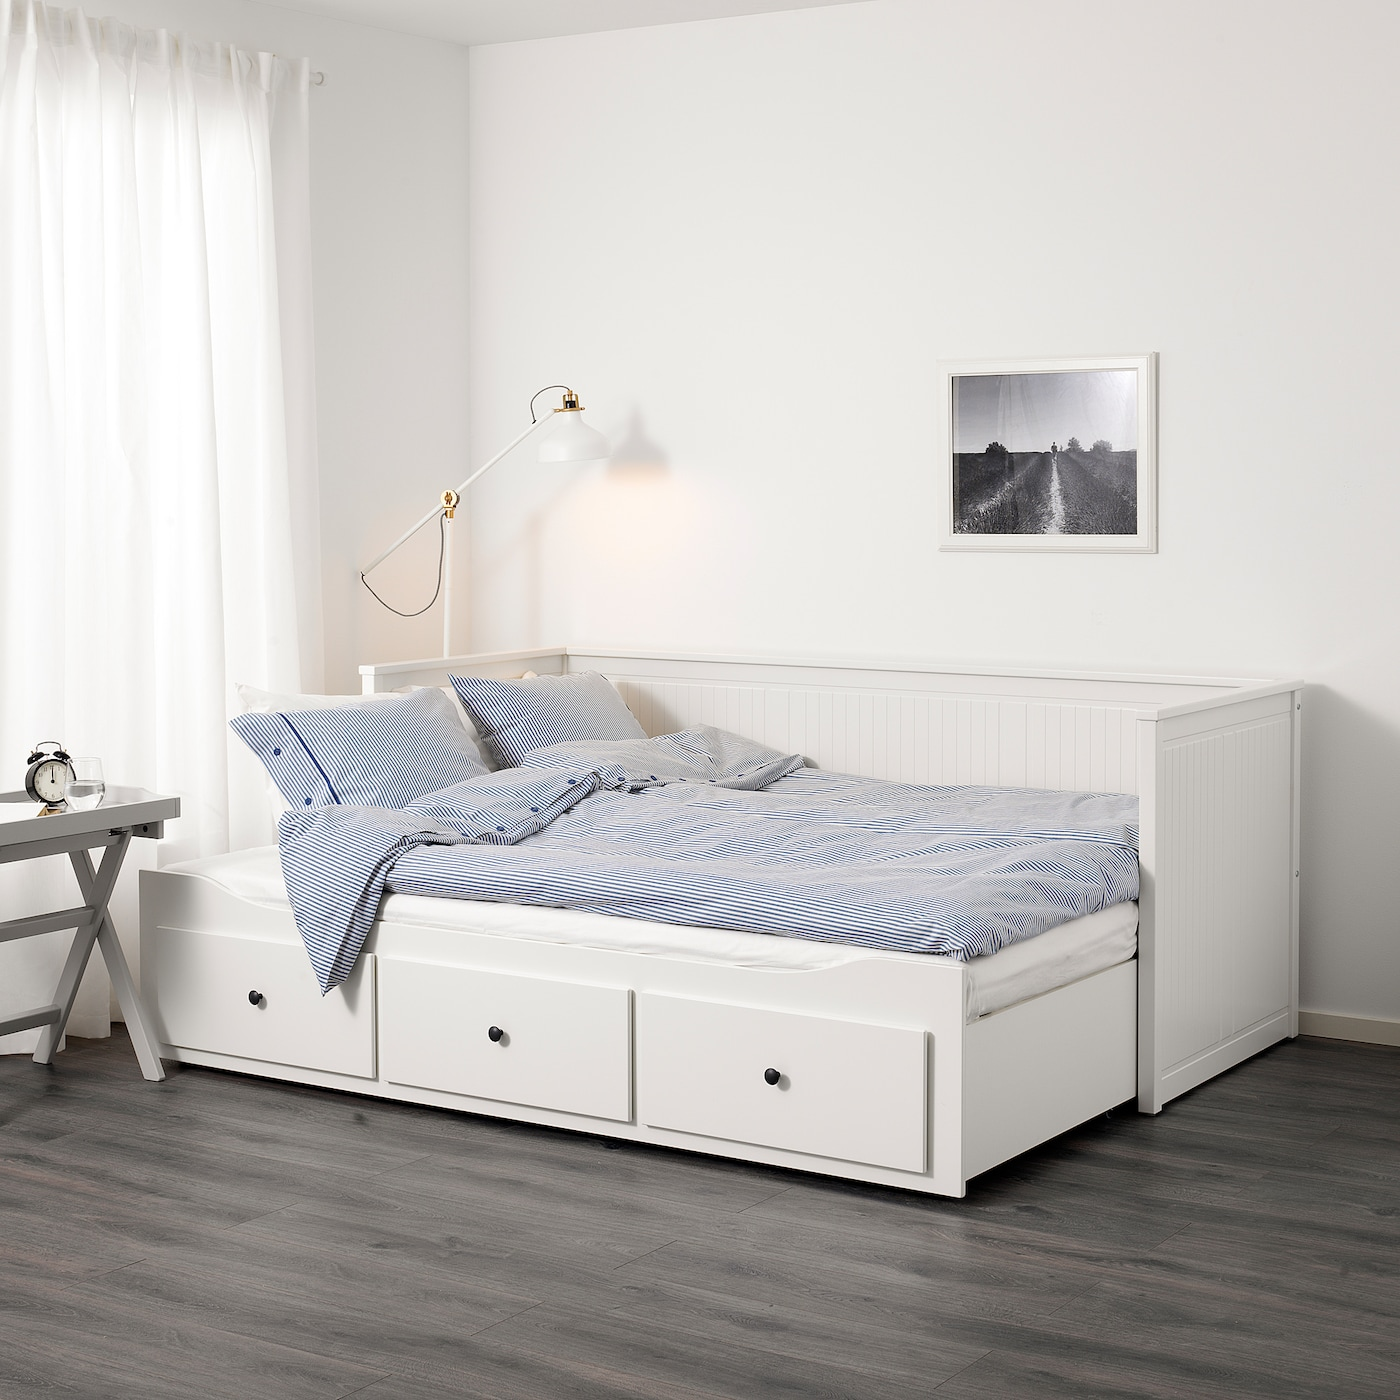 cama individual hemnes ikea